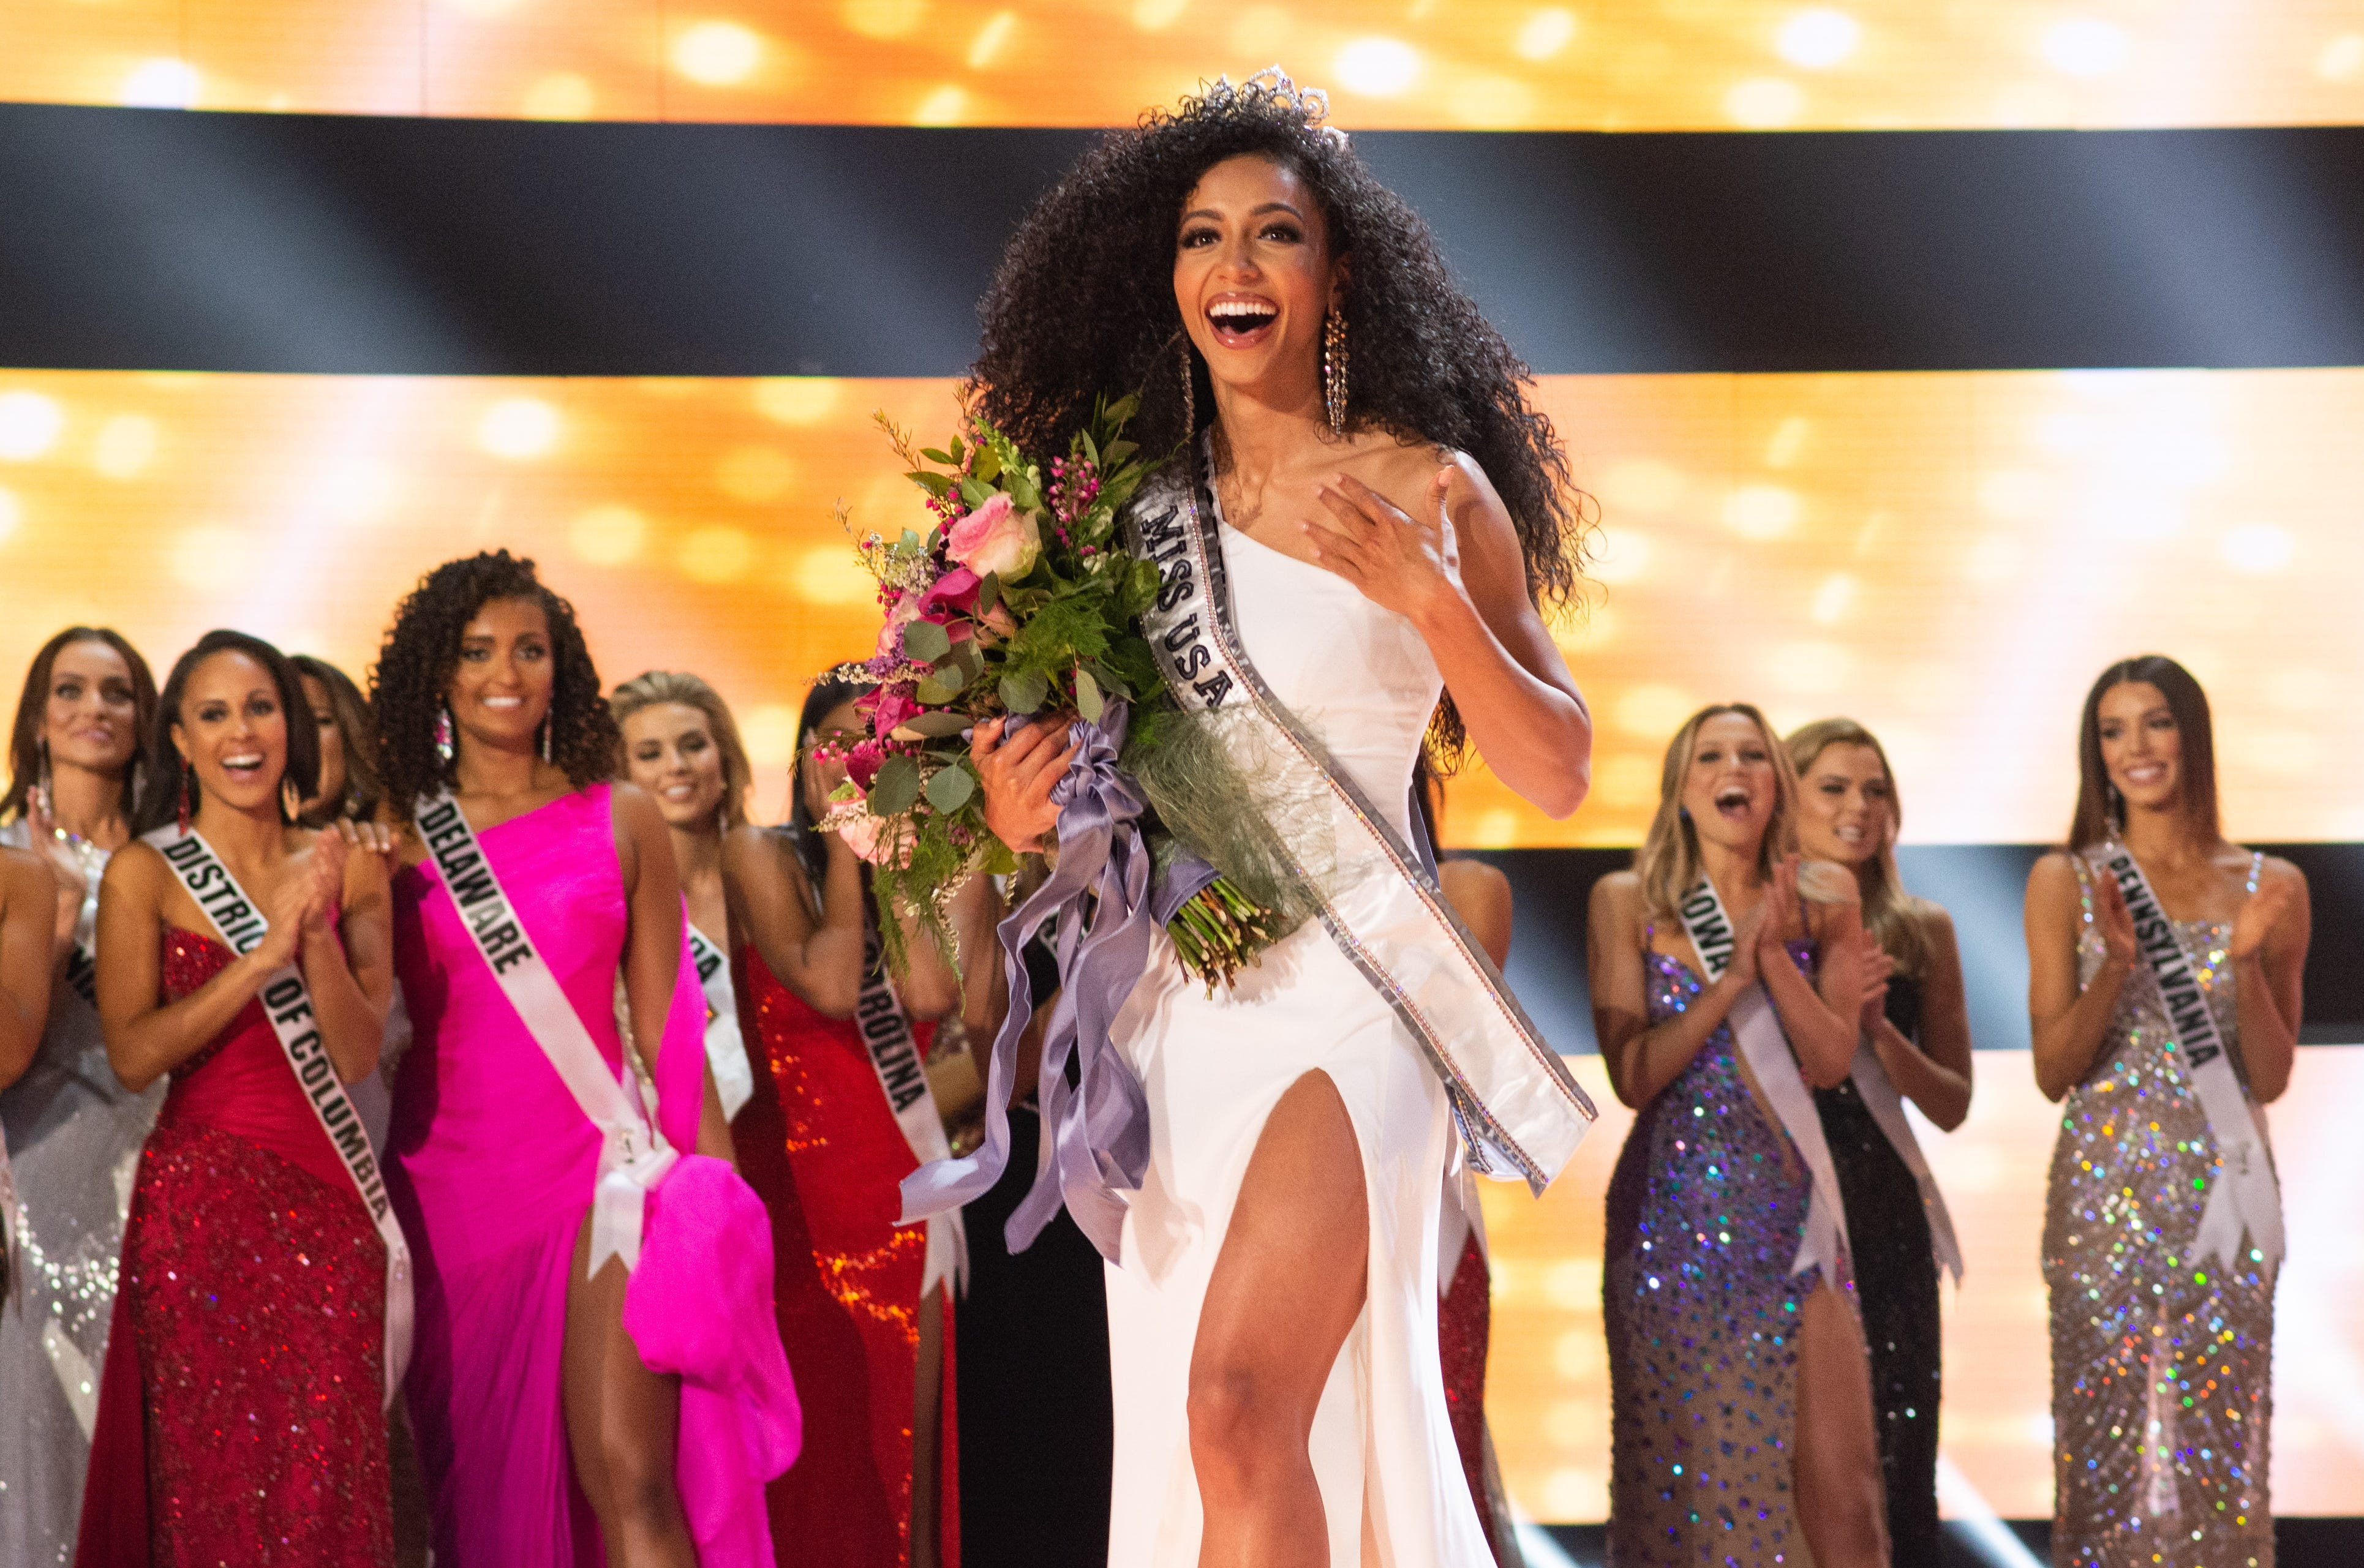 Chelsie Kryst, Miss North Carolina is crowned Miss USA 2019.